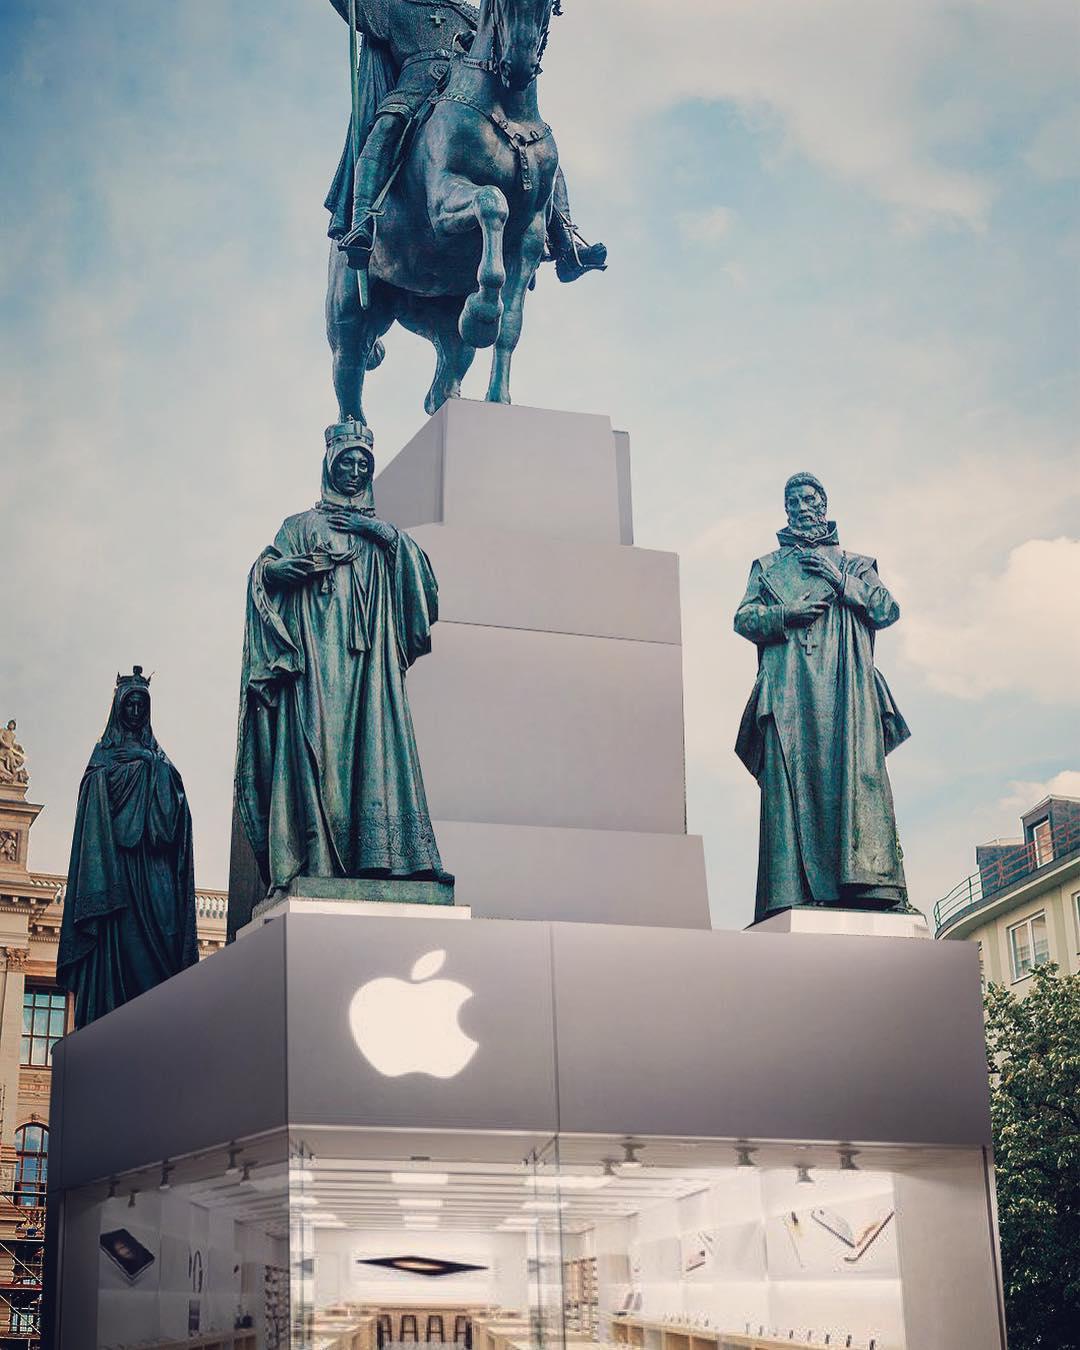 Apple Store Vaclav